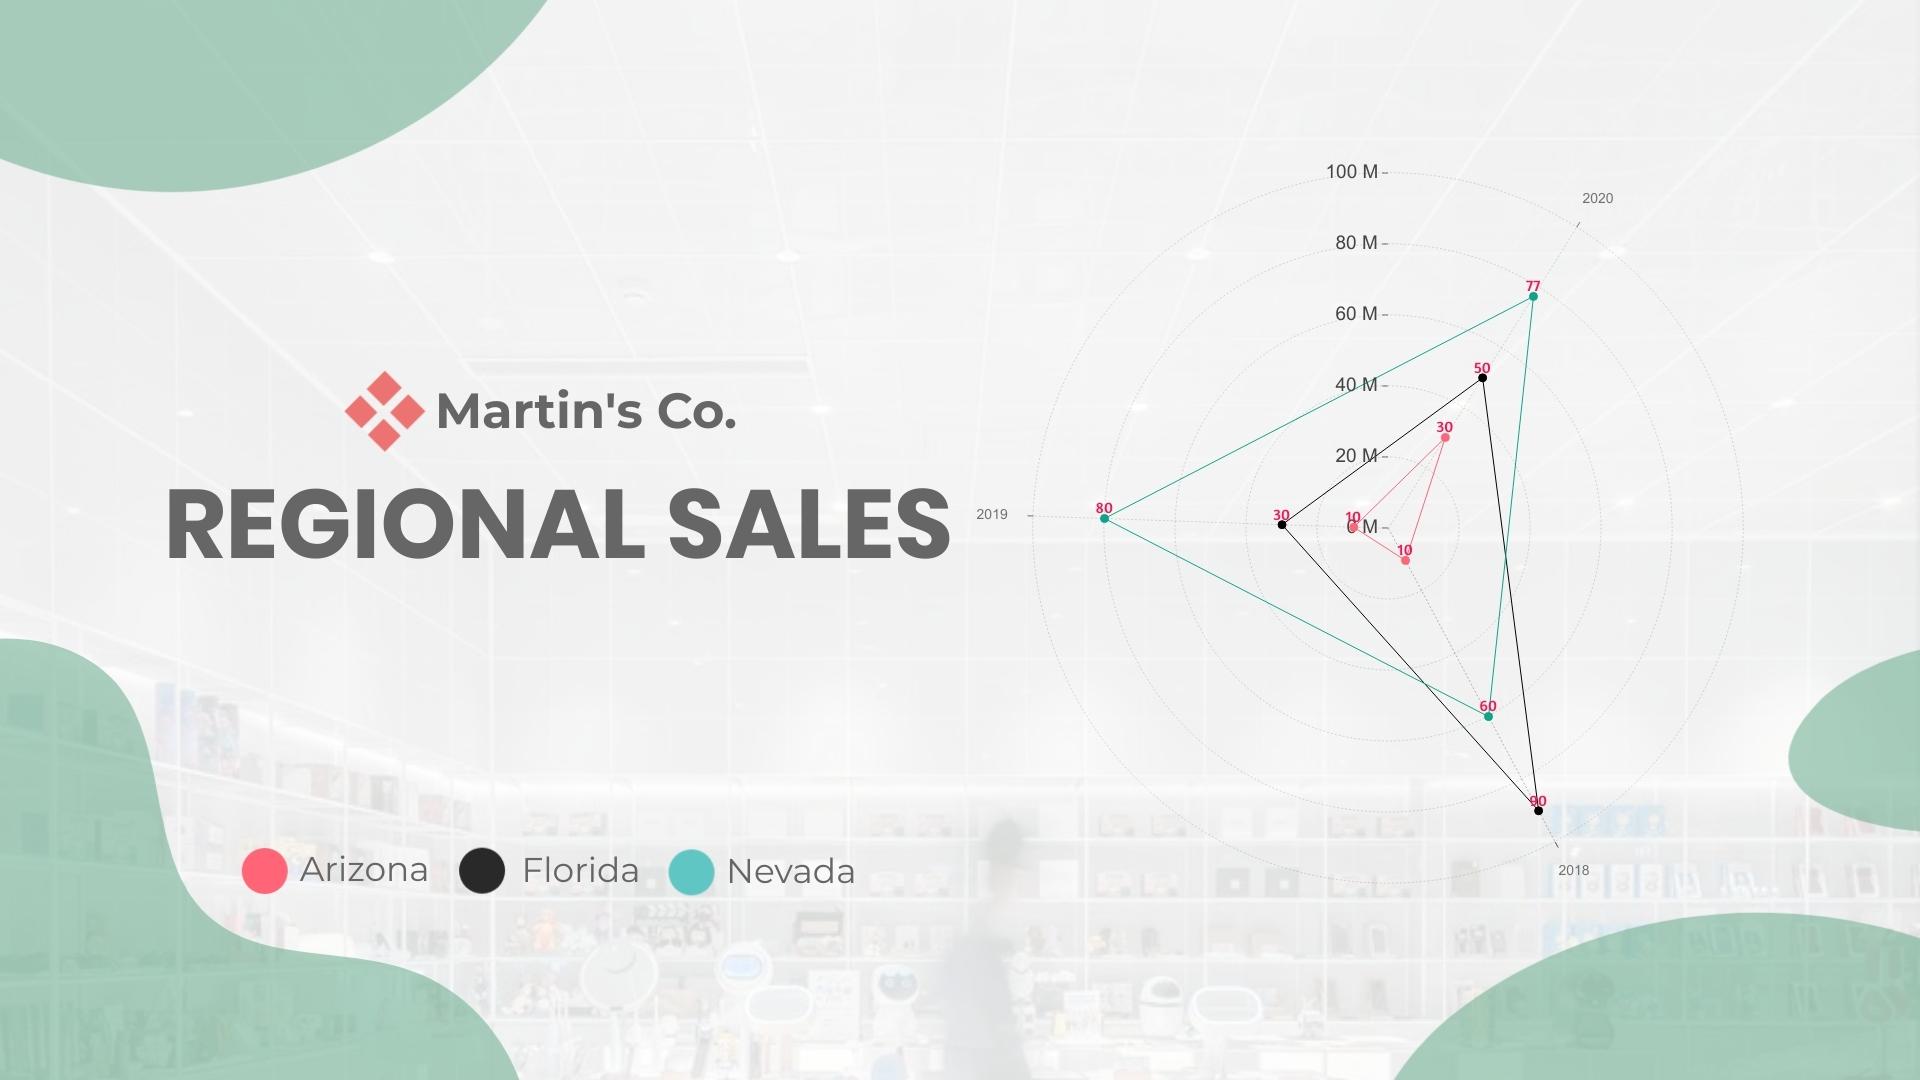 Regional Sales of Martins Co - Radar Chart Template